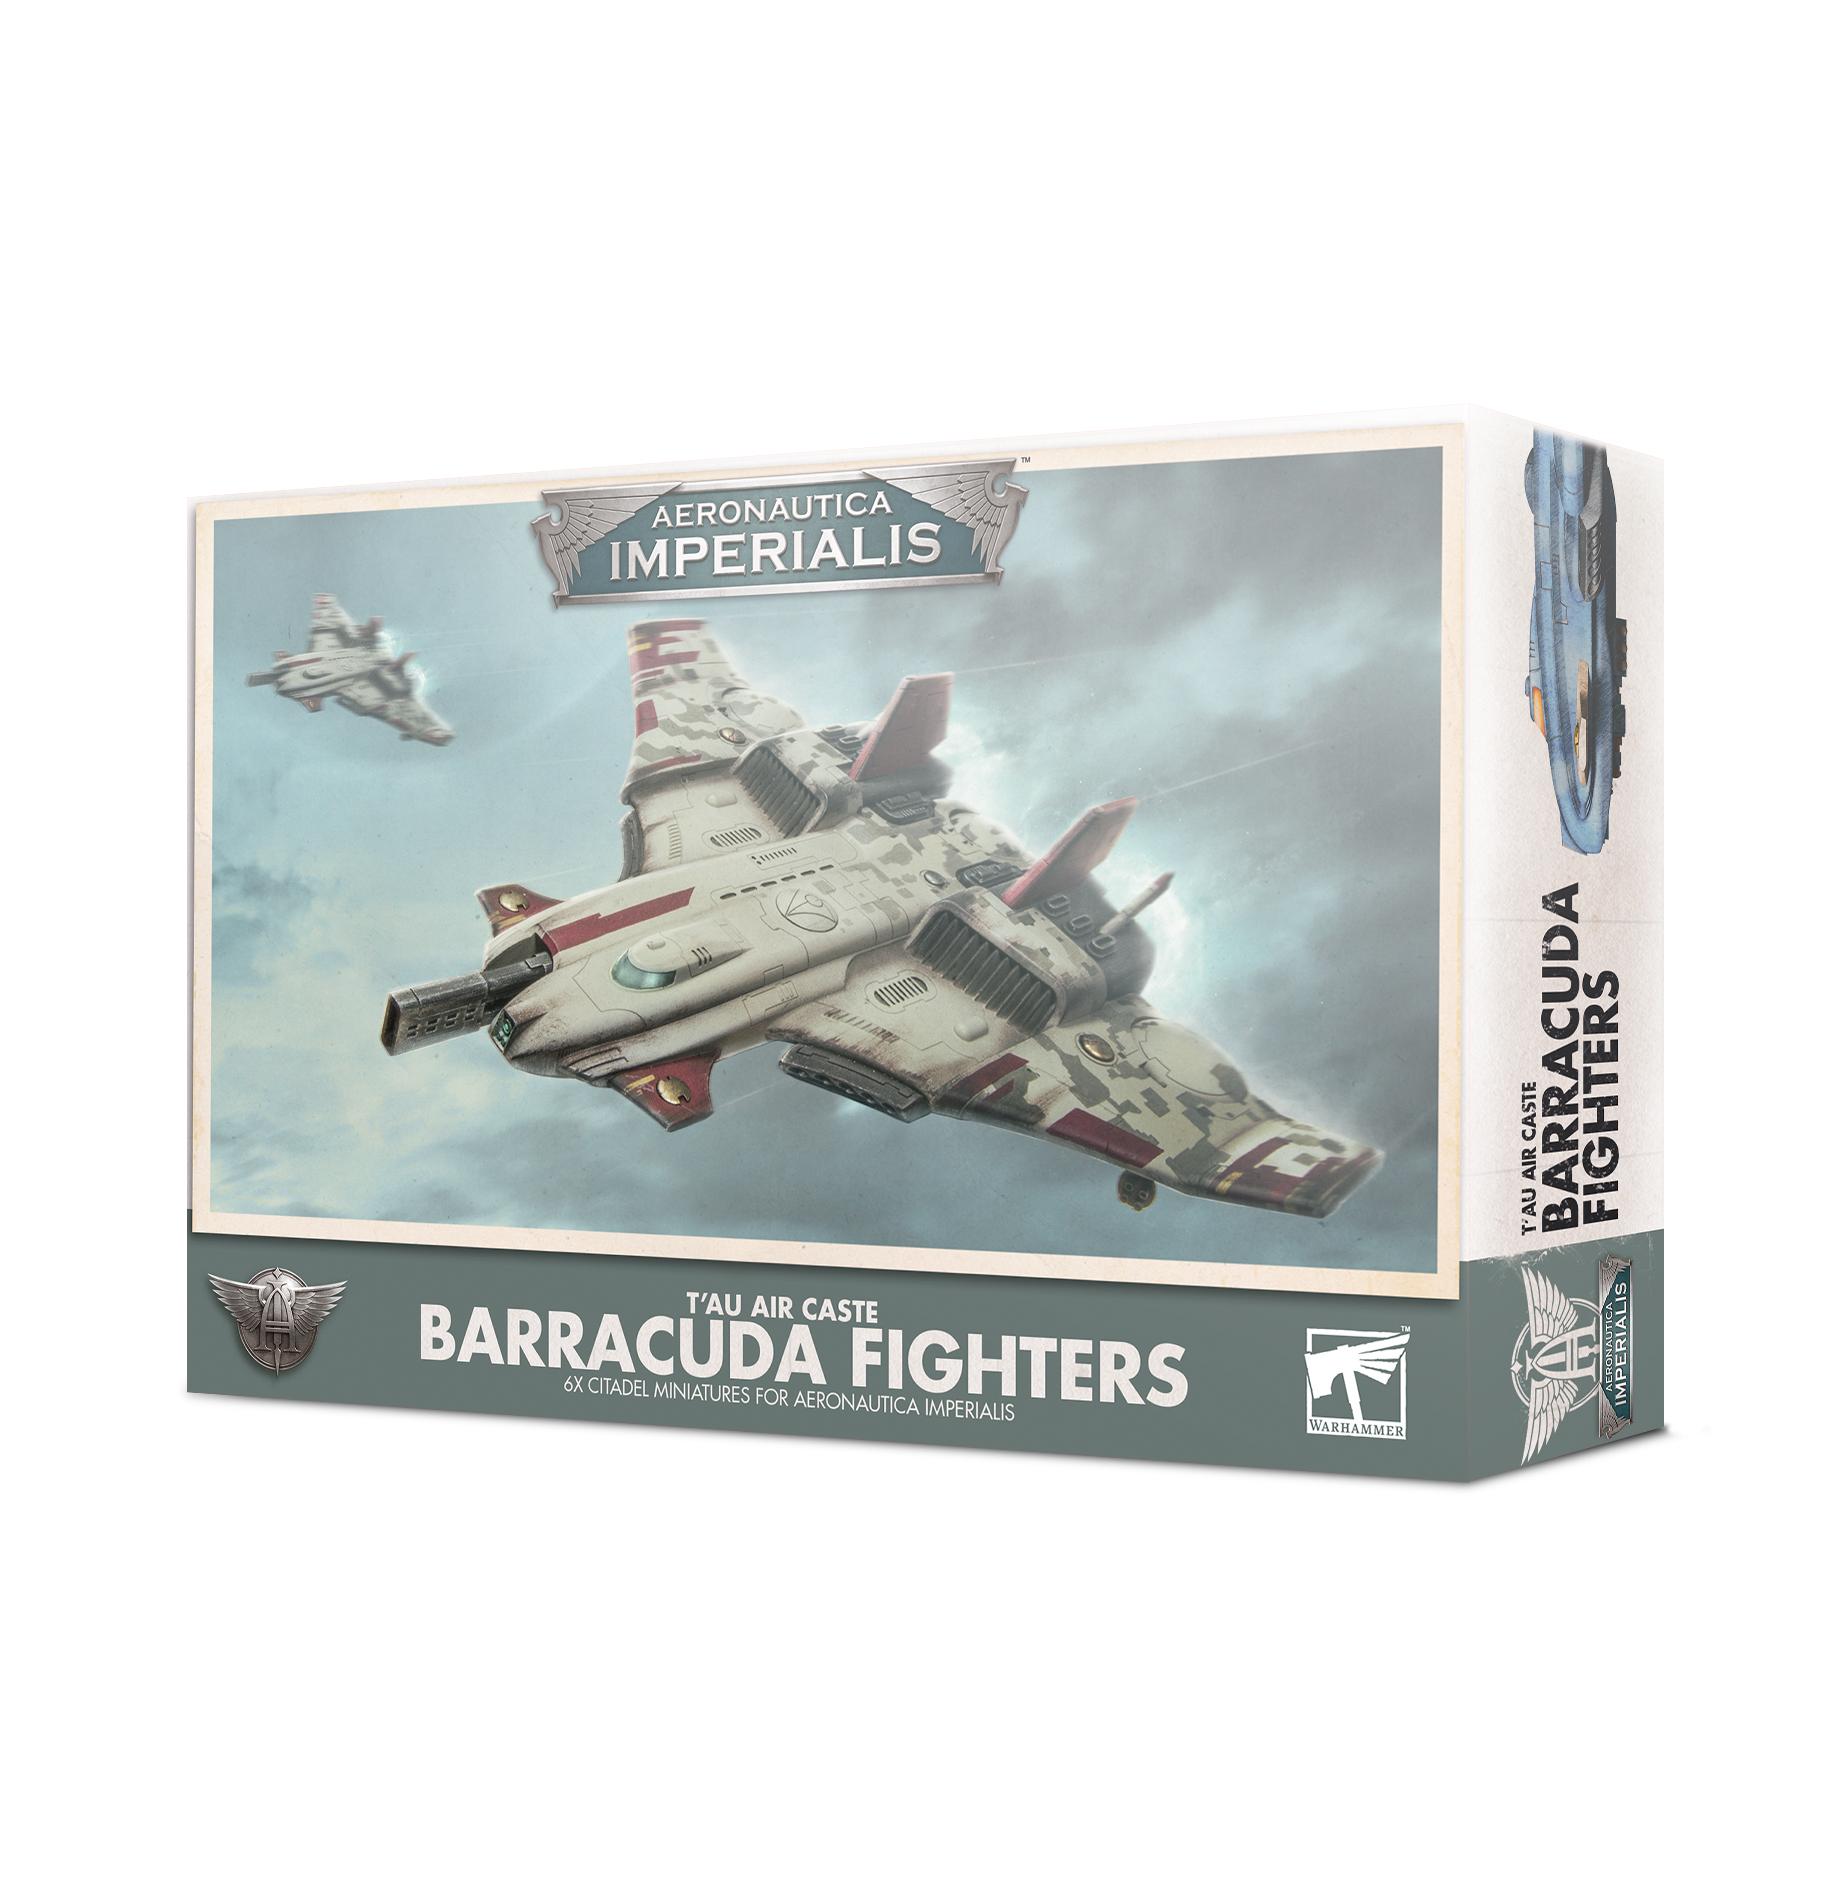 Aero/Imperialis: Tau Air Caste Barracuda Fights 500-29